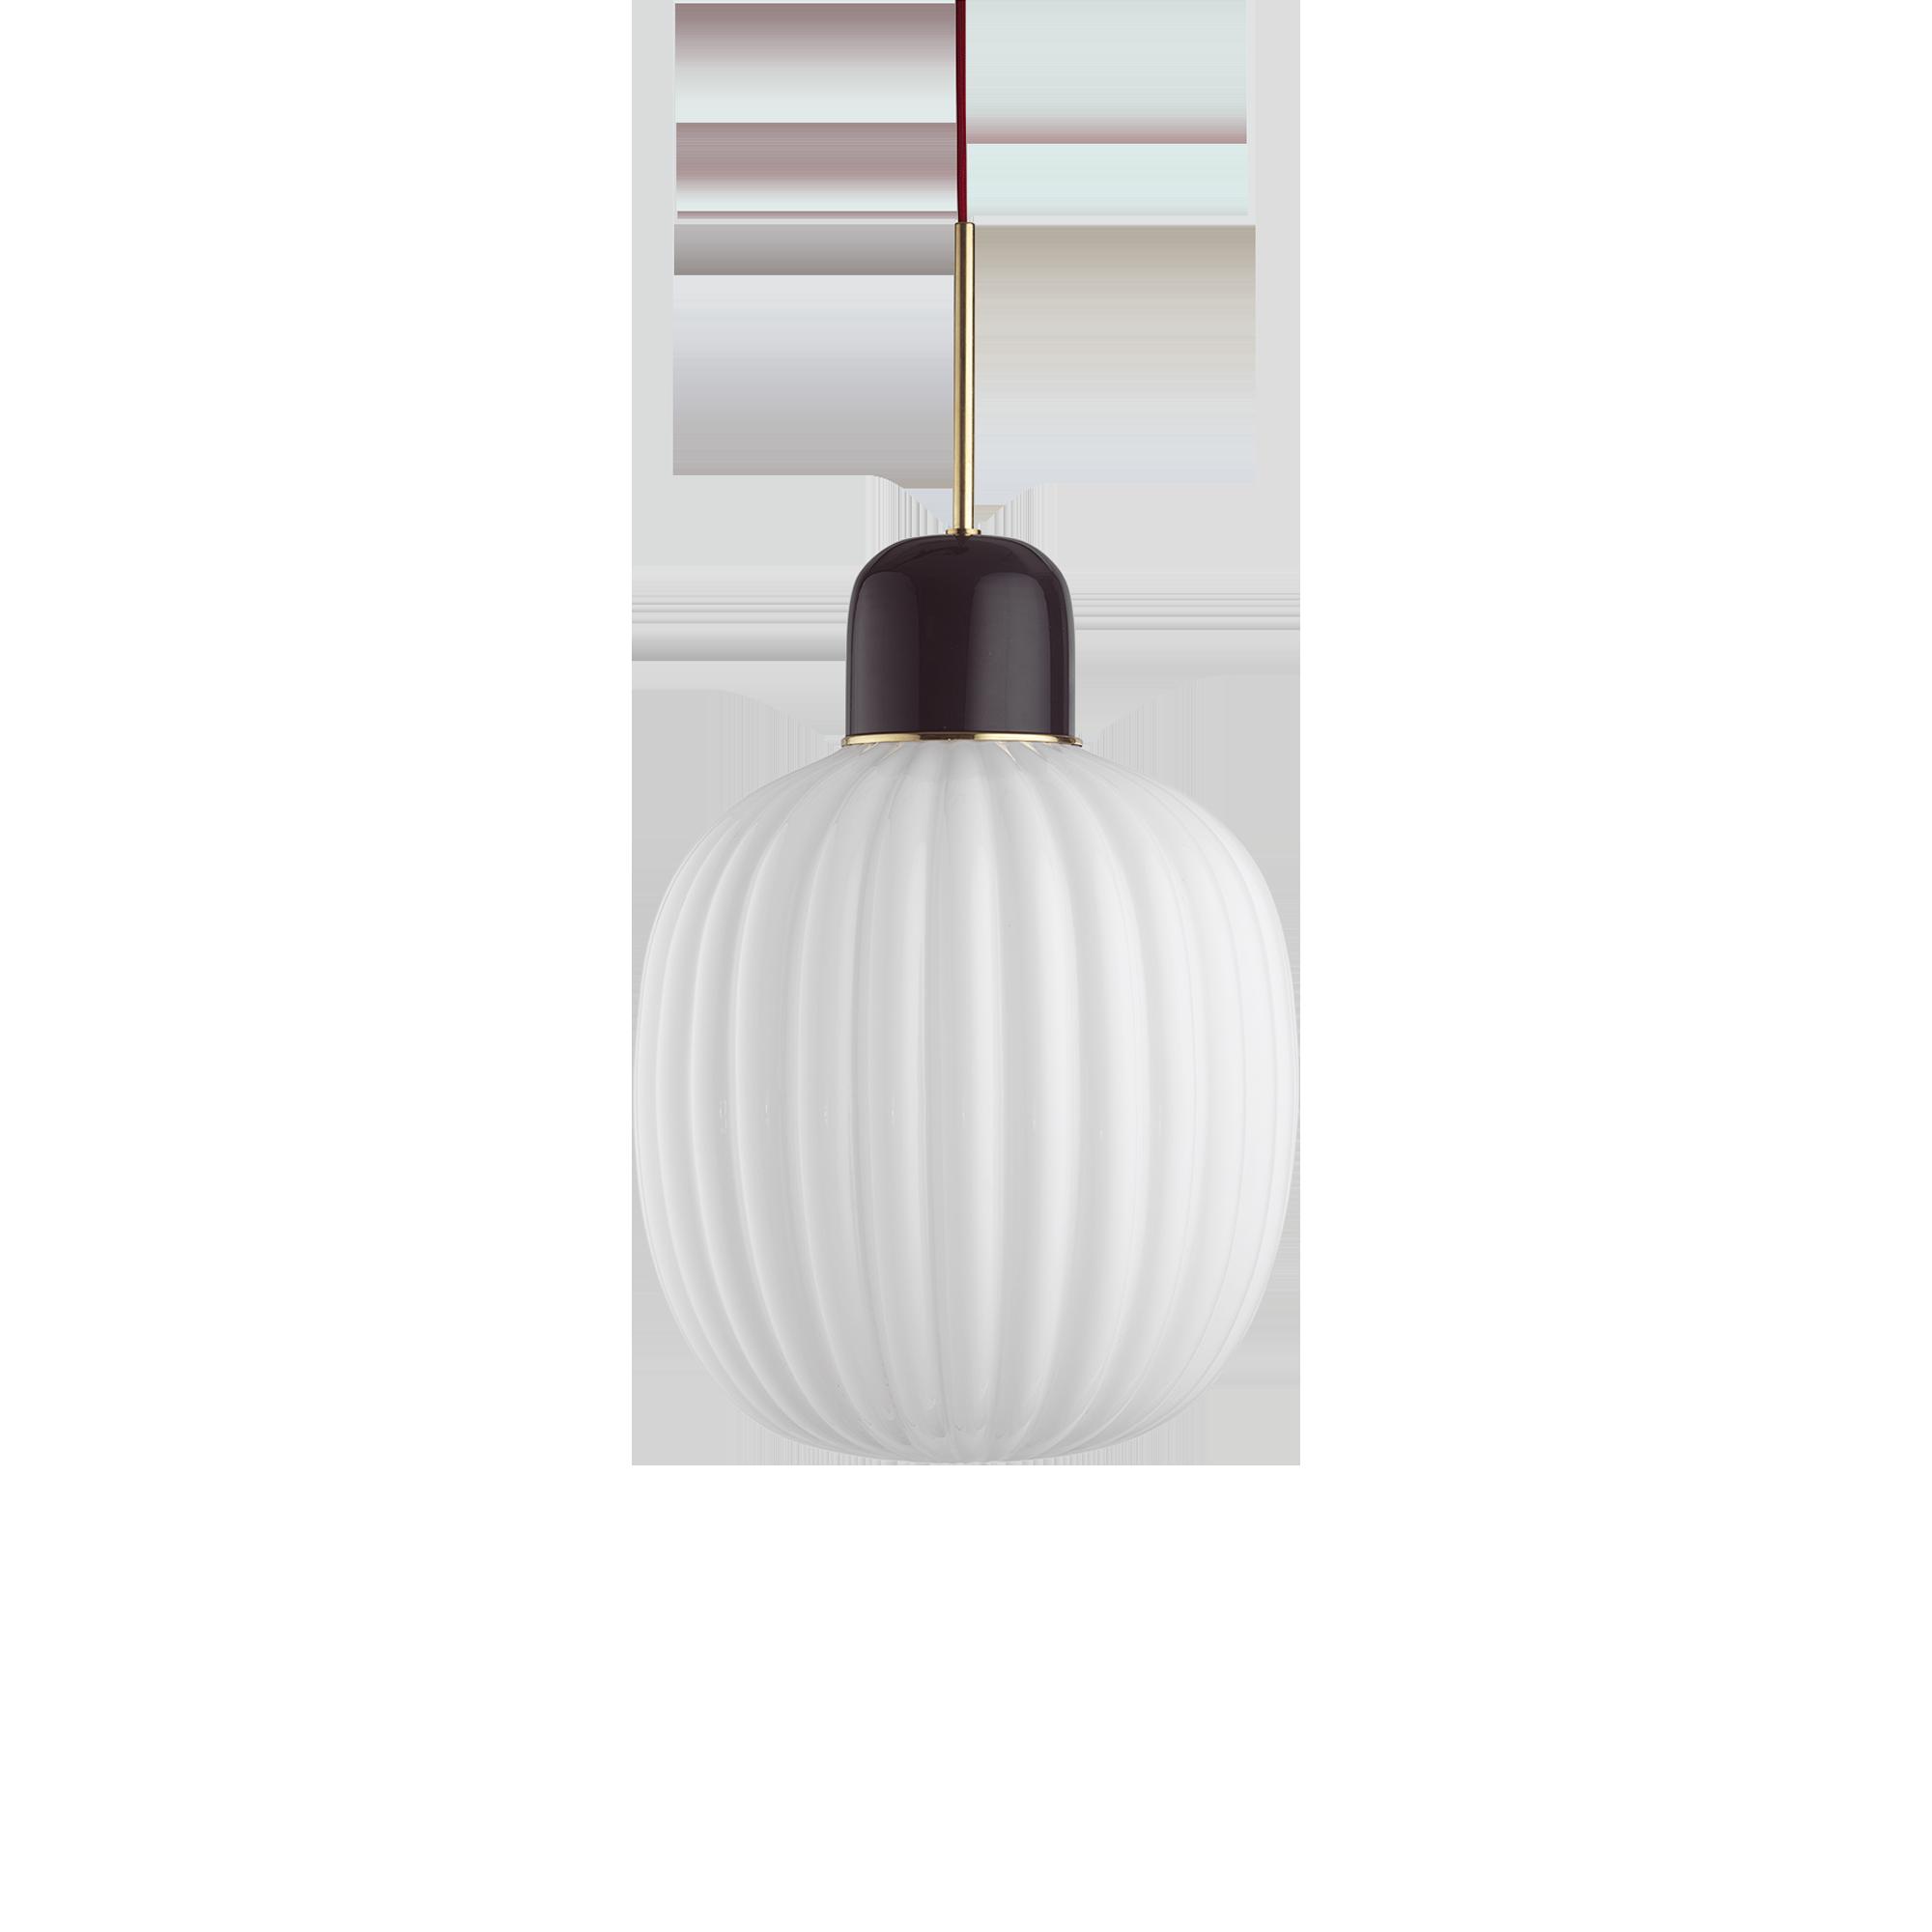 Casanova ceiling lamp - India Mahdavi